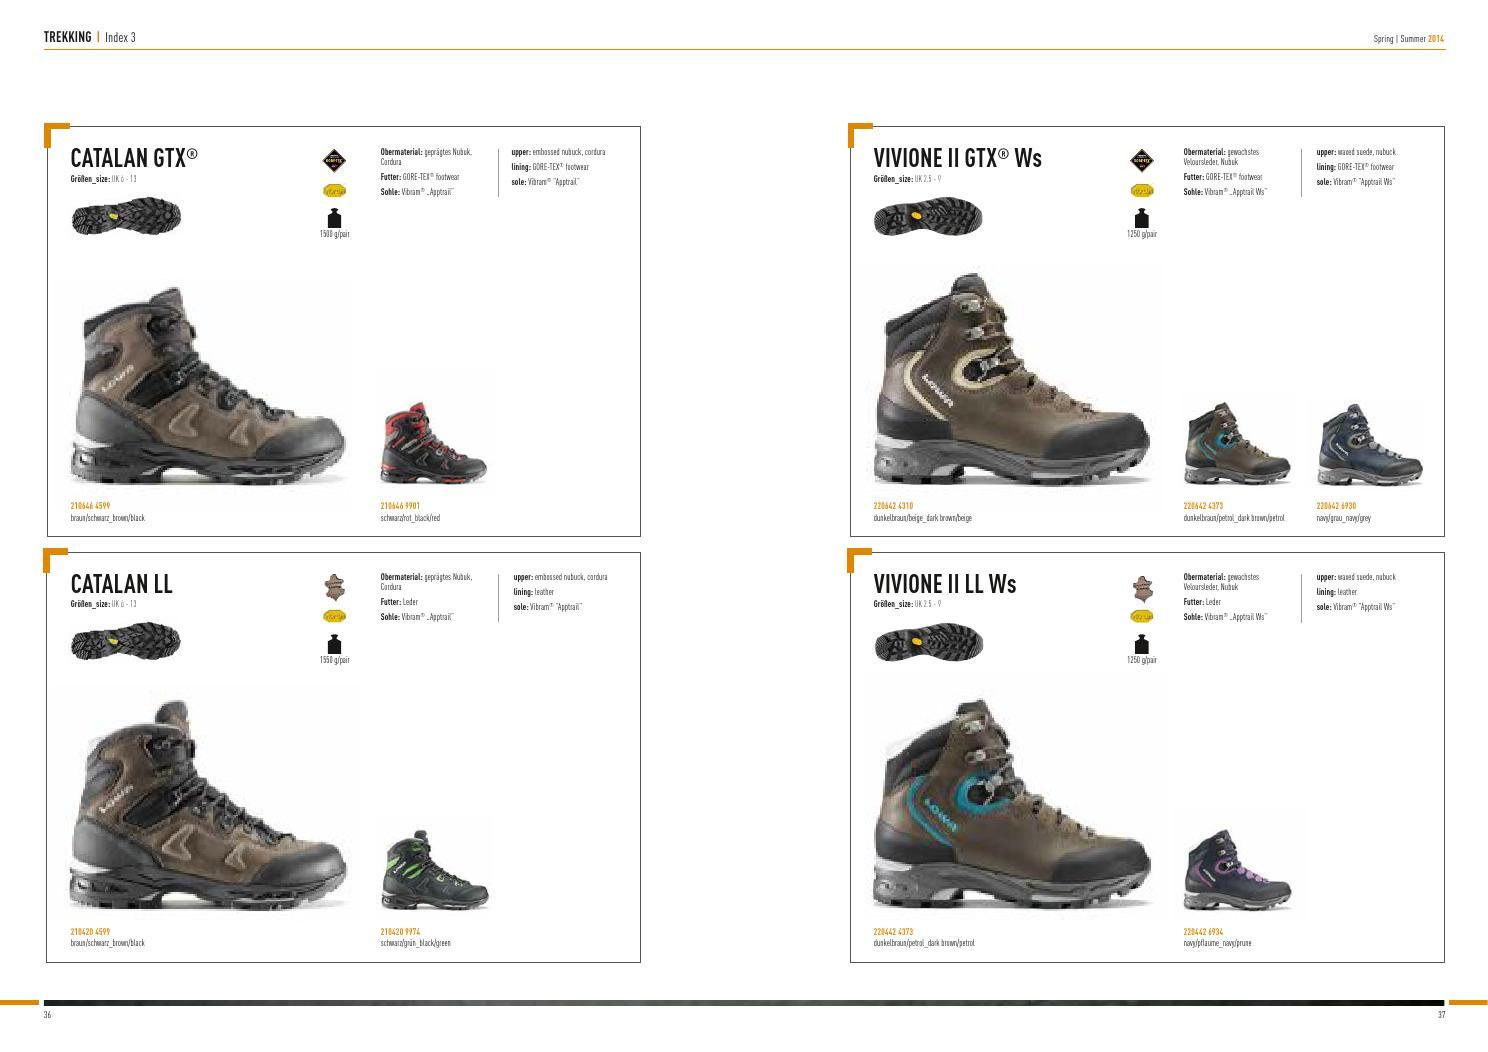 3f314a0a0d7bf5 LOWA Outdoor-Katalog 2014 by Schöffel-LOWA Stores - issuu